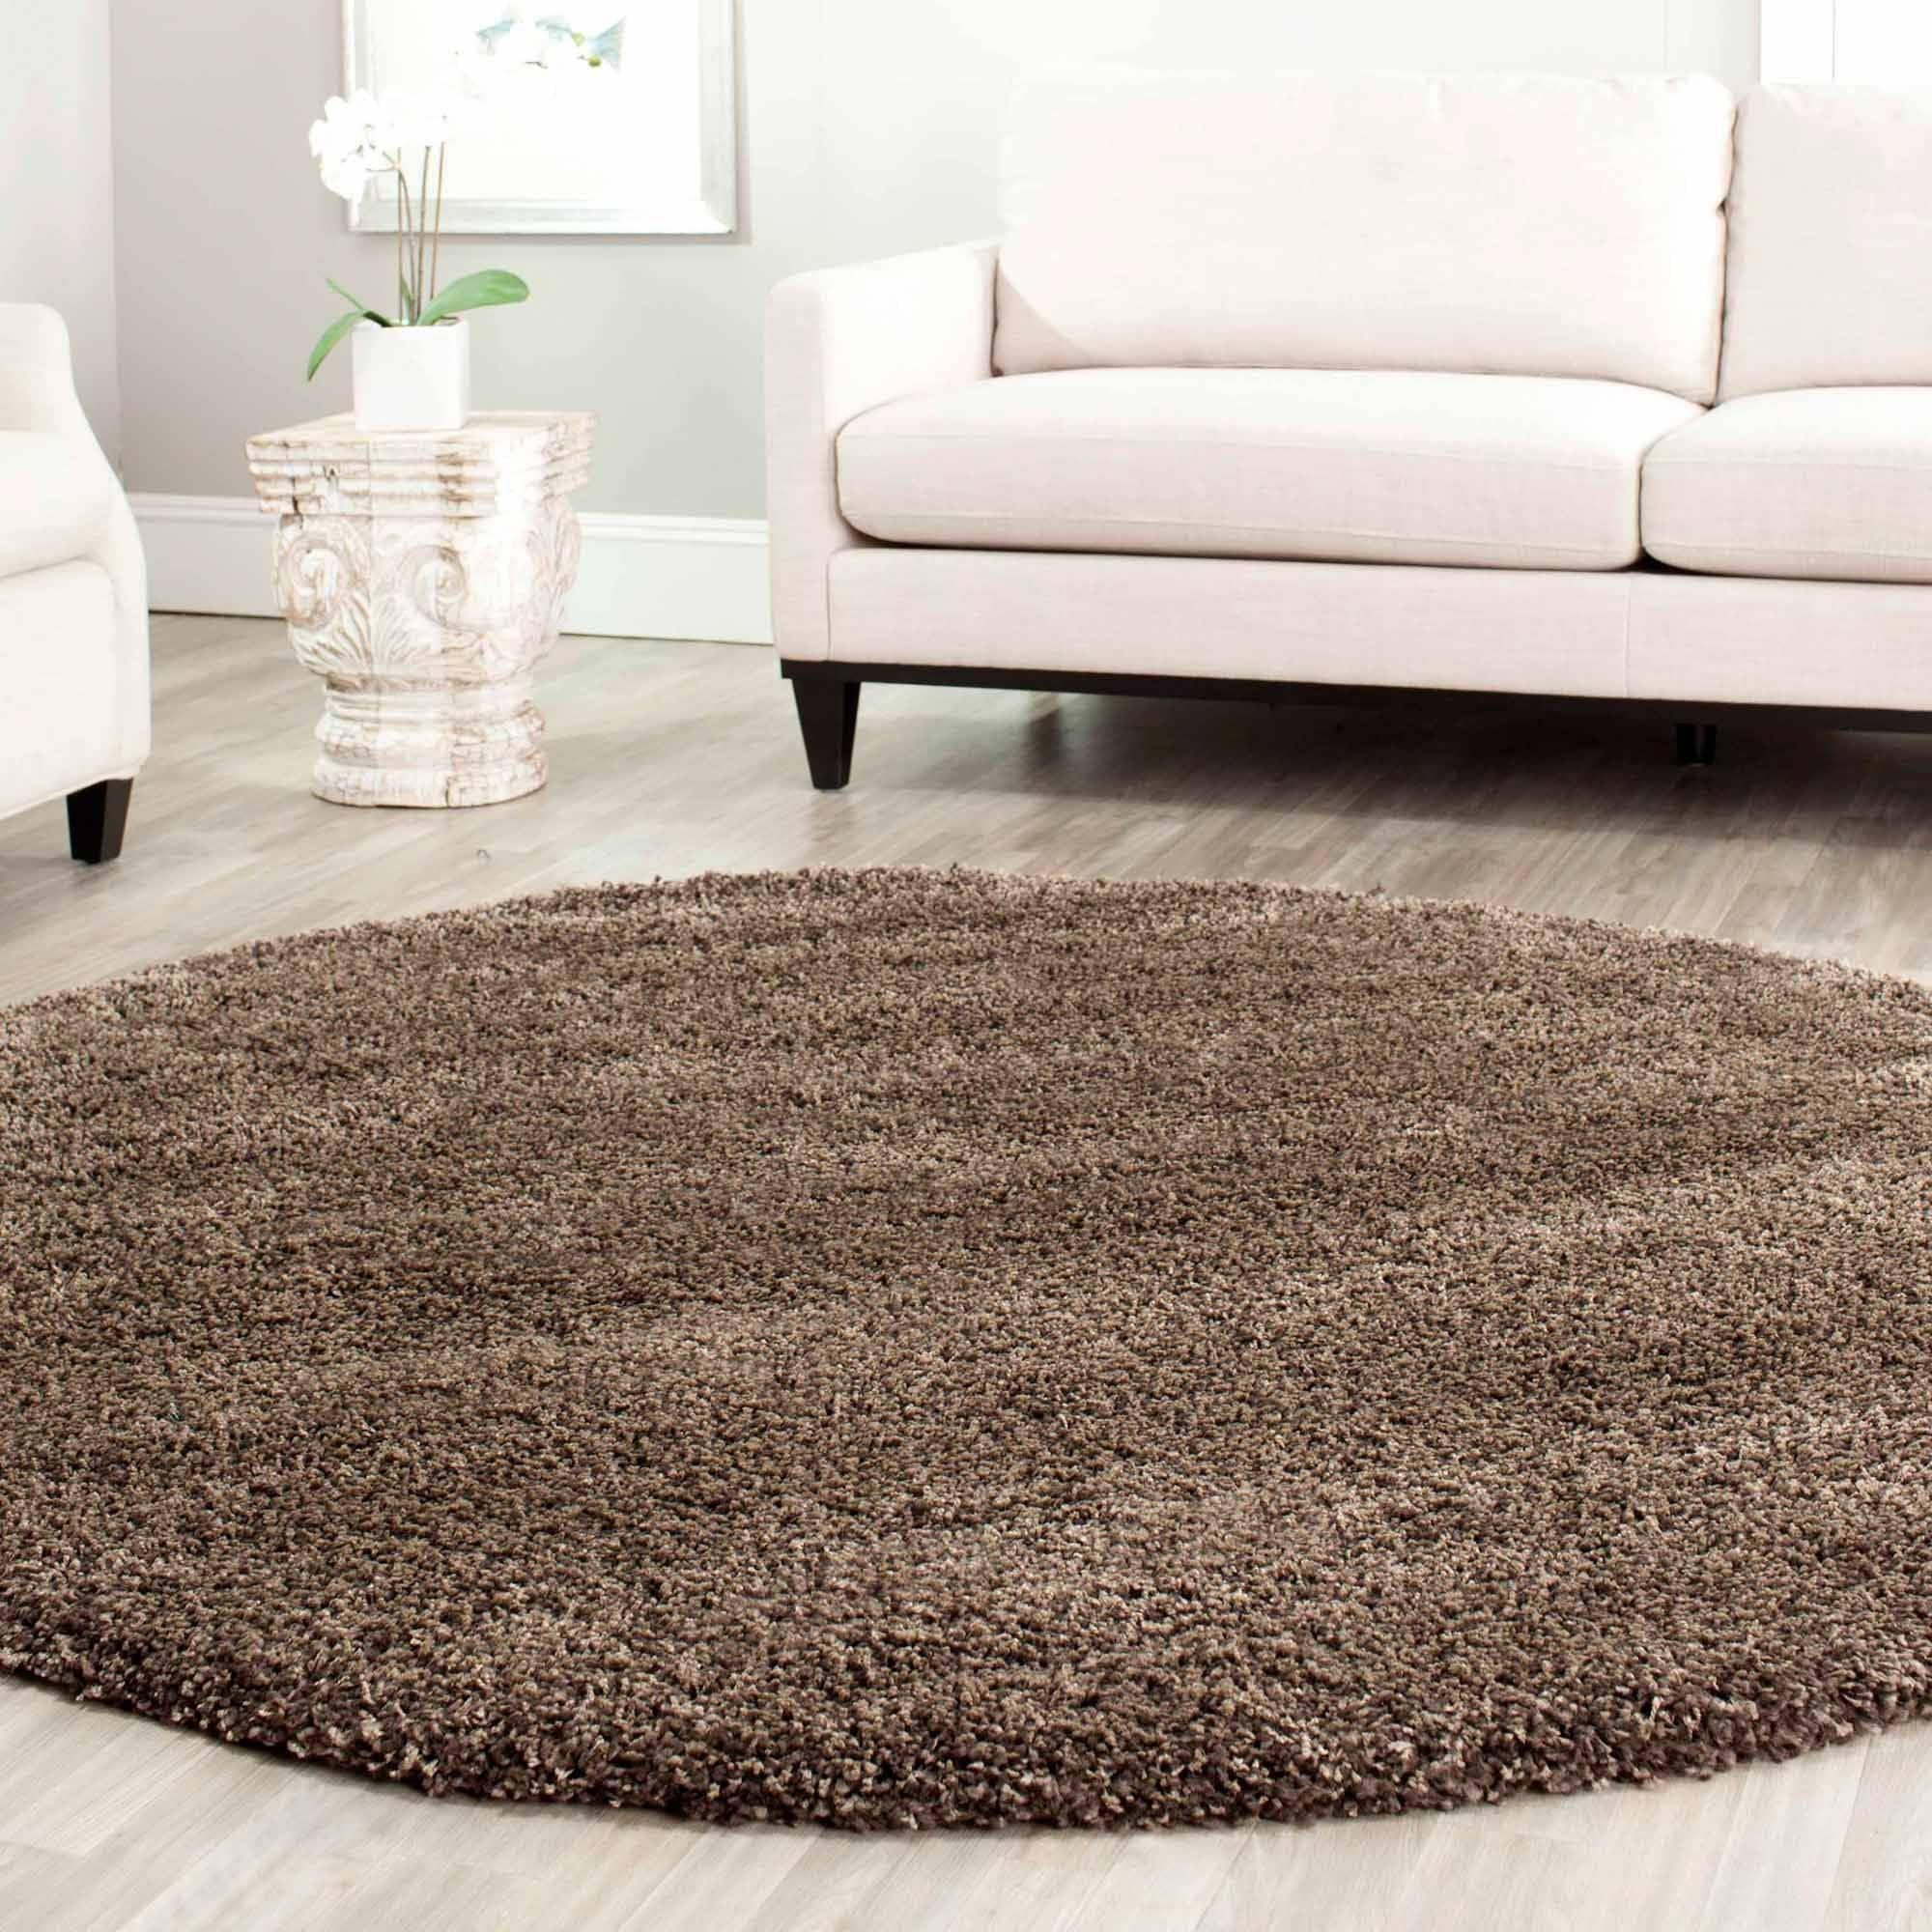 area jute rugs akumal domaci rug round hero newspaper daydream products and